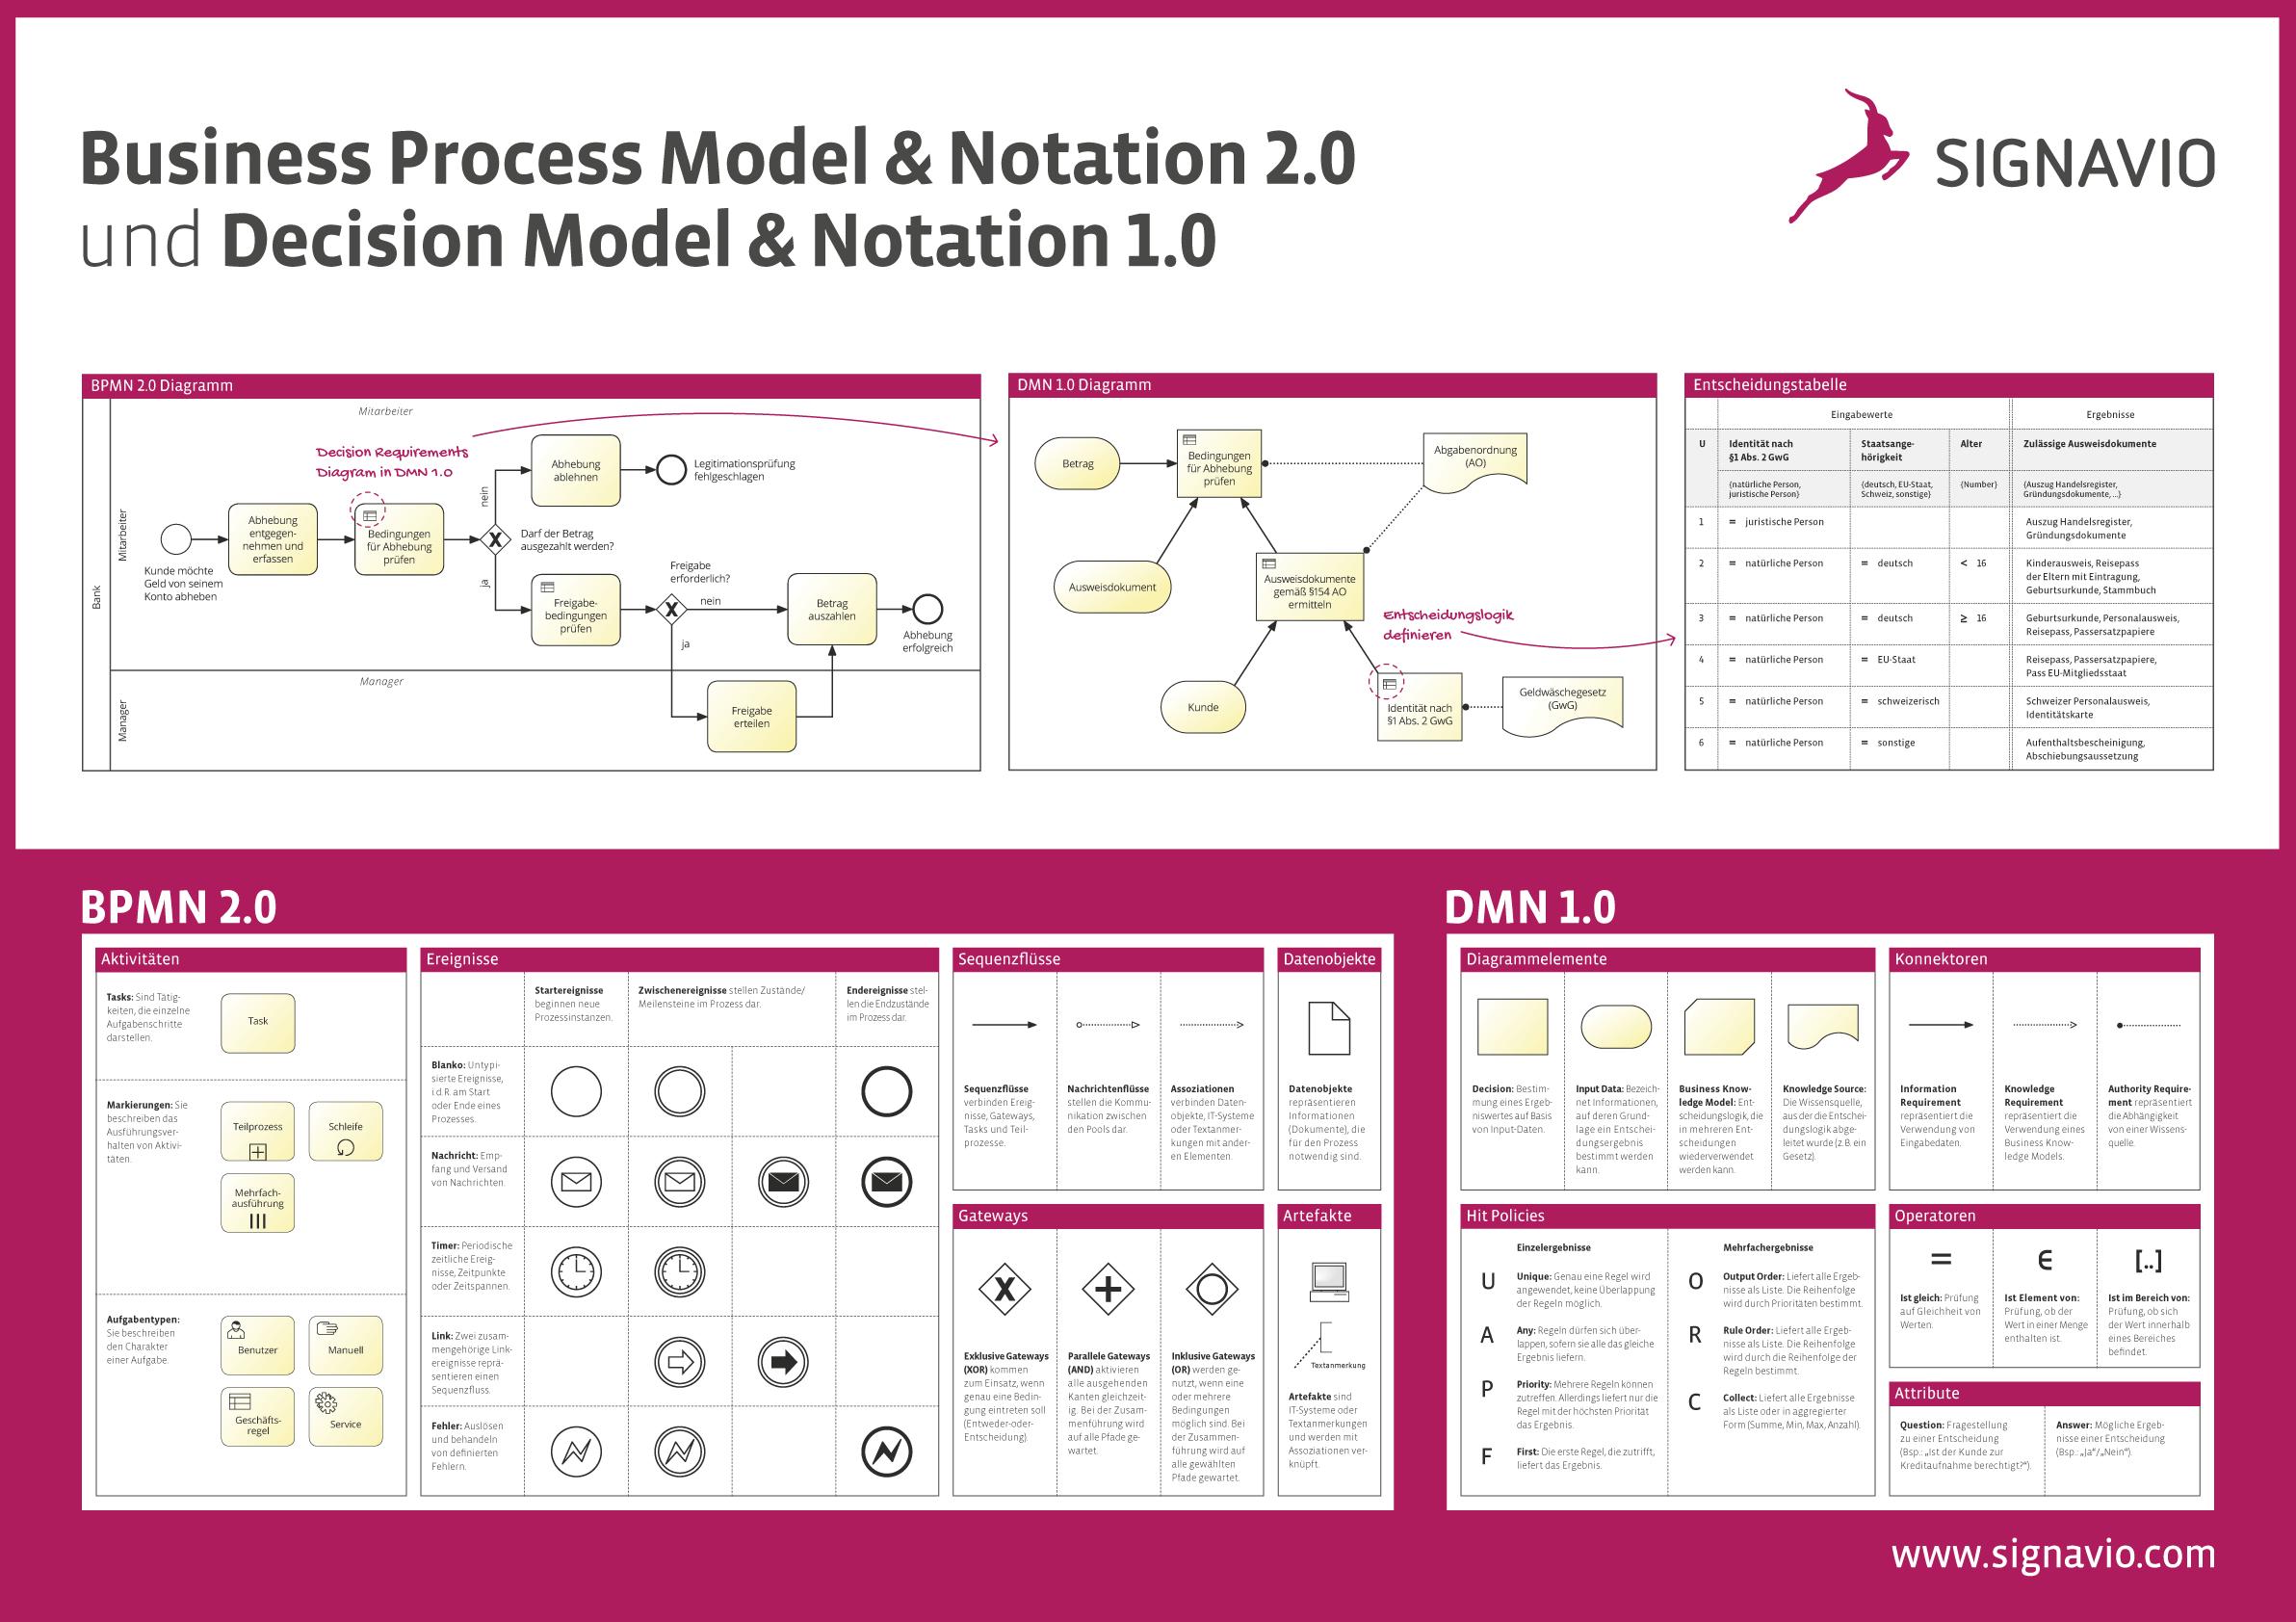 Vorschaubild Business Process Model & Notation 2.0 and Decision Model & Notation 1.0 Poster